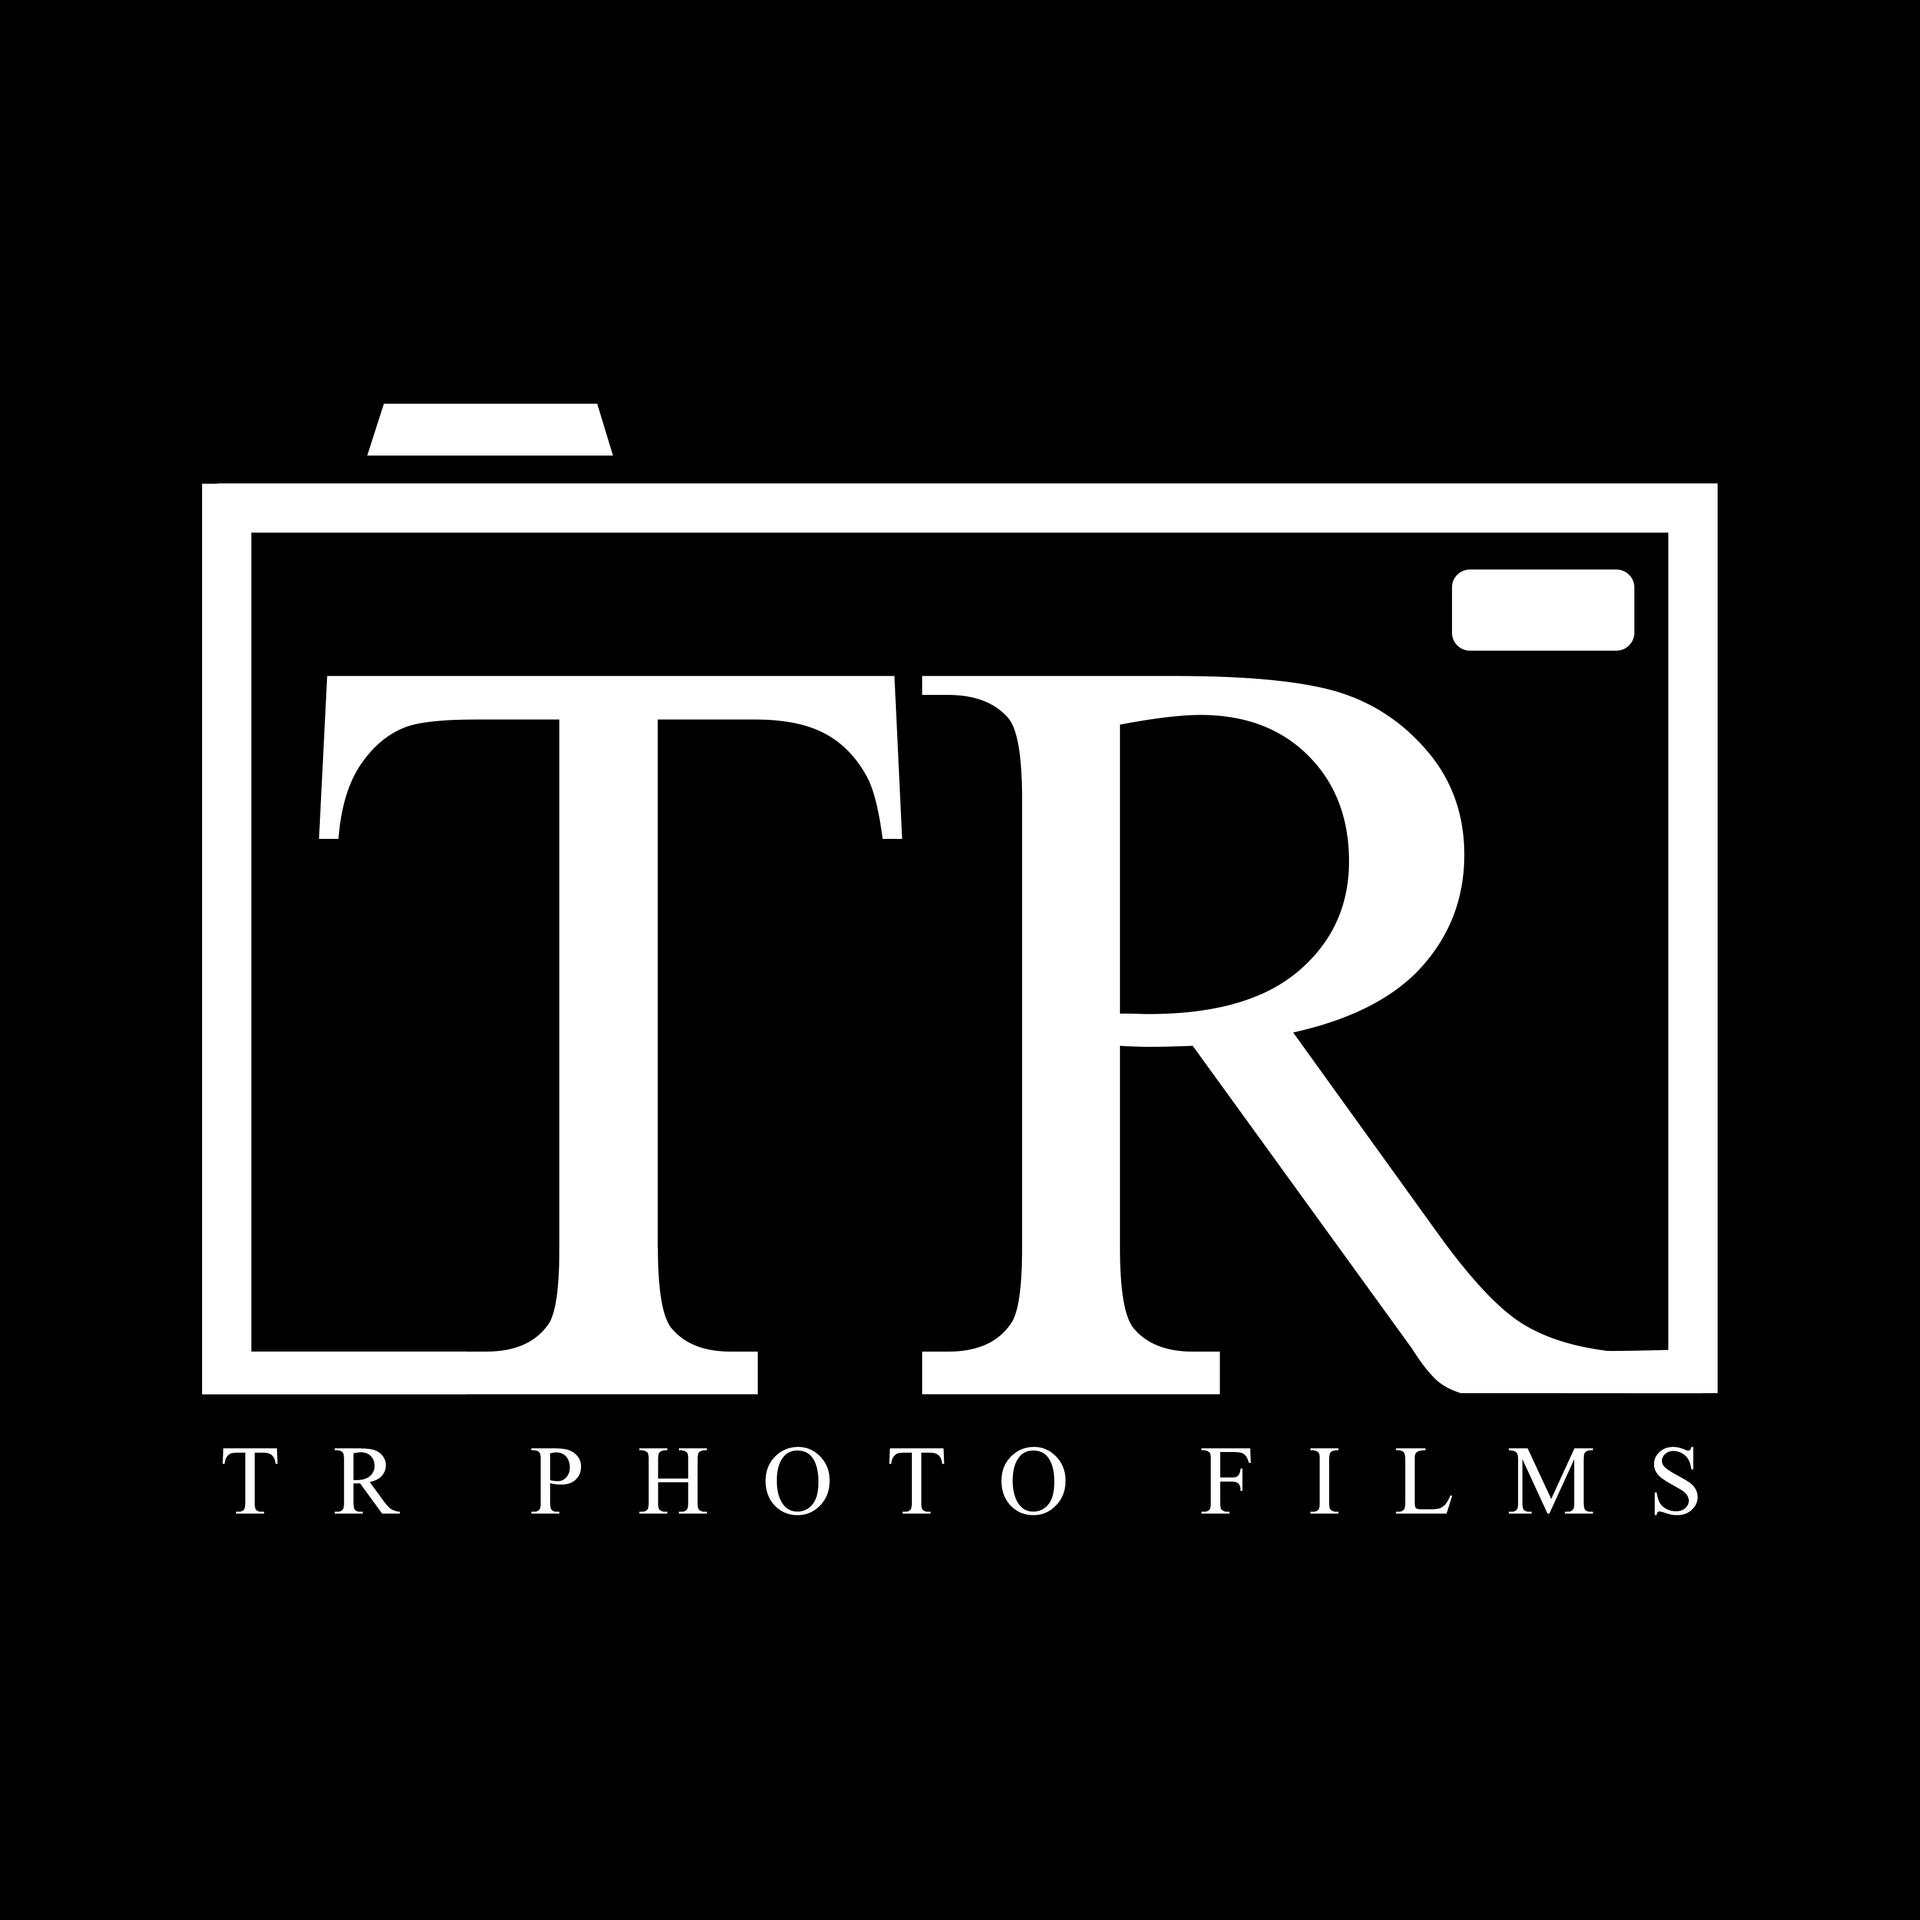 HOME - TR PHOTO FILMS